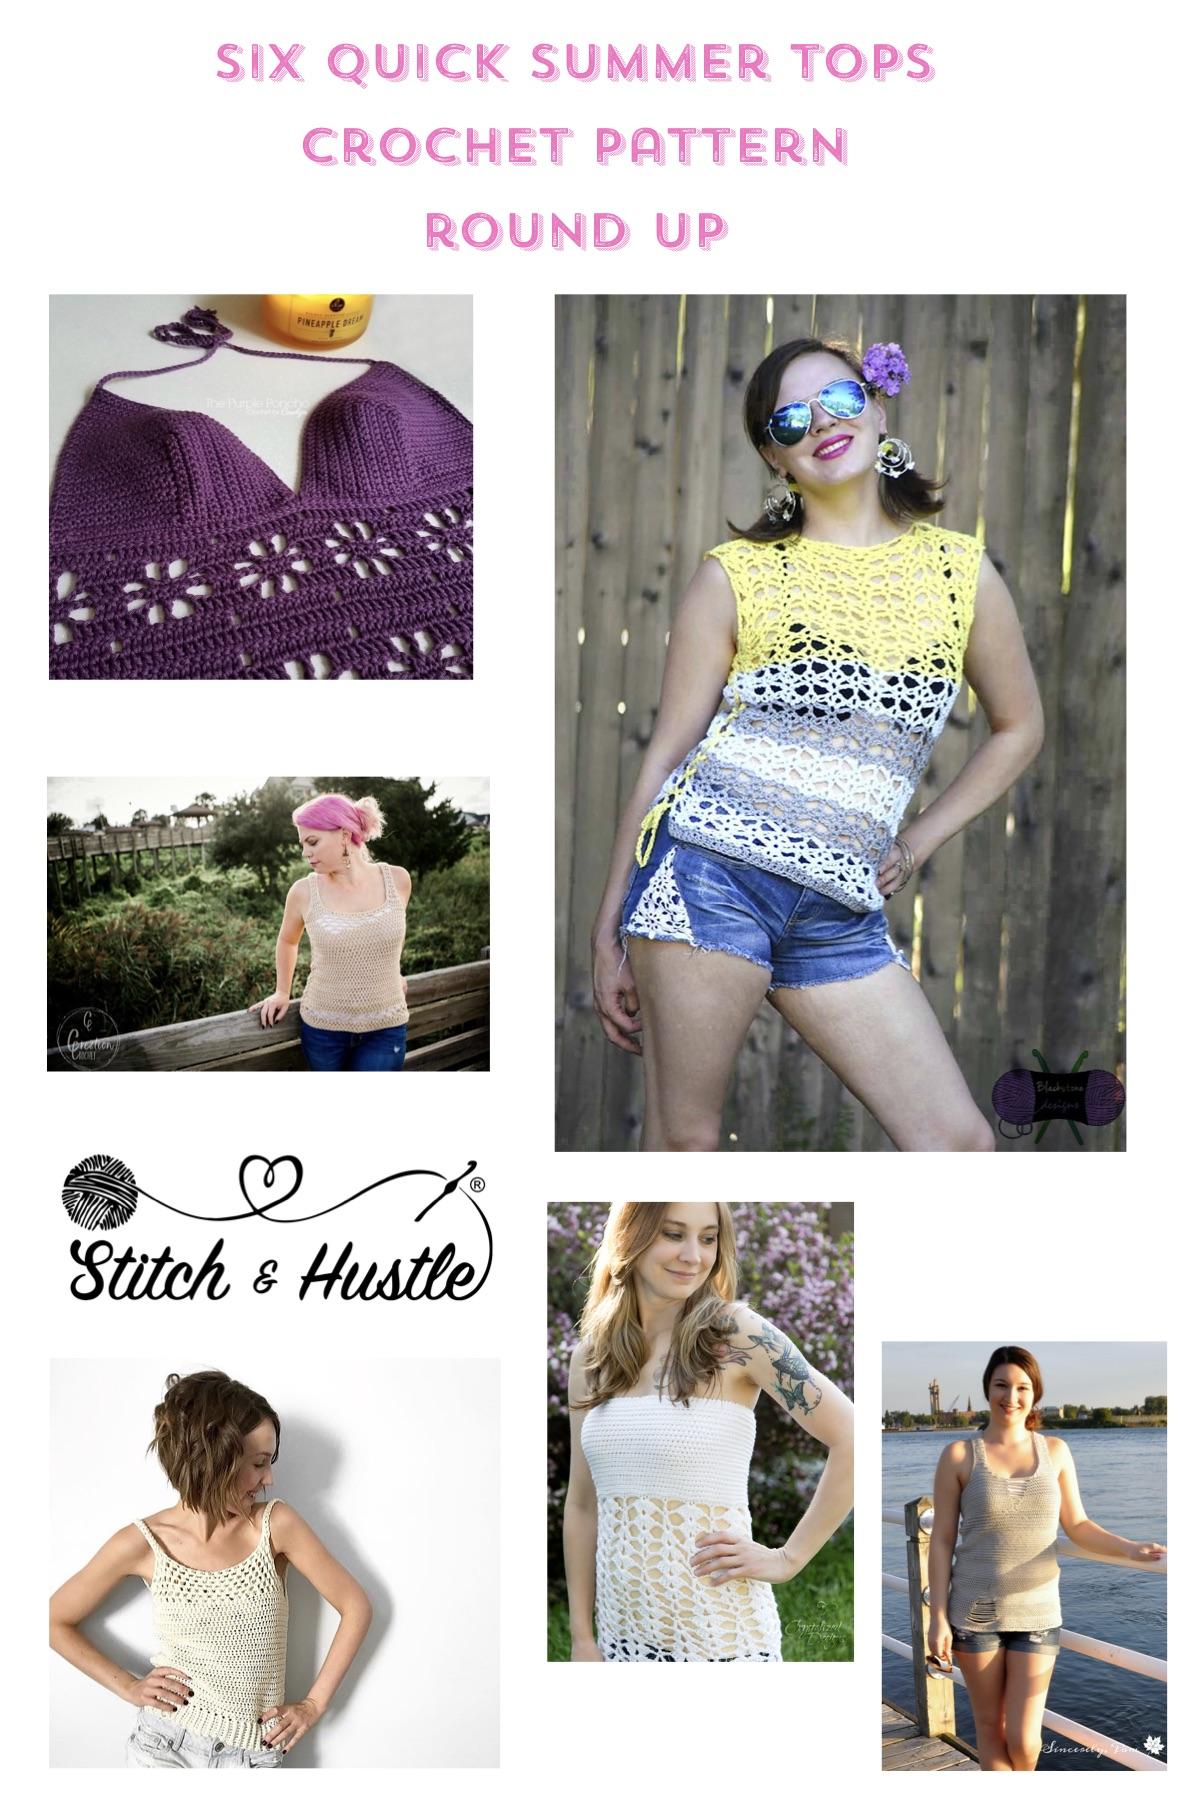 SummerTops_Crochet_Pattern_RoundUp_1.jpg